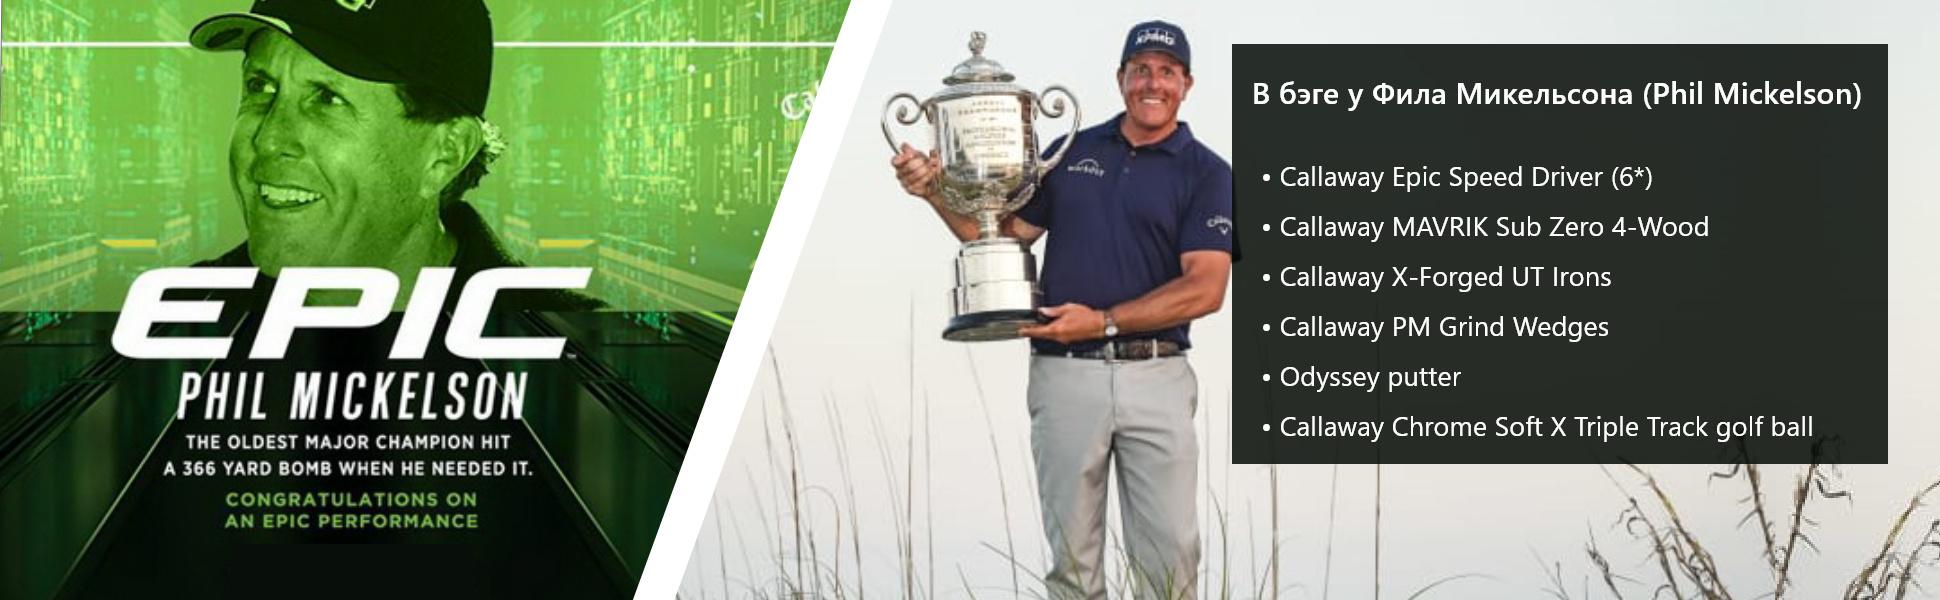 Phil Mickelson выиграв the PGA Championship at Kiawah Island